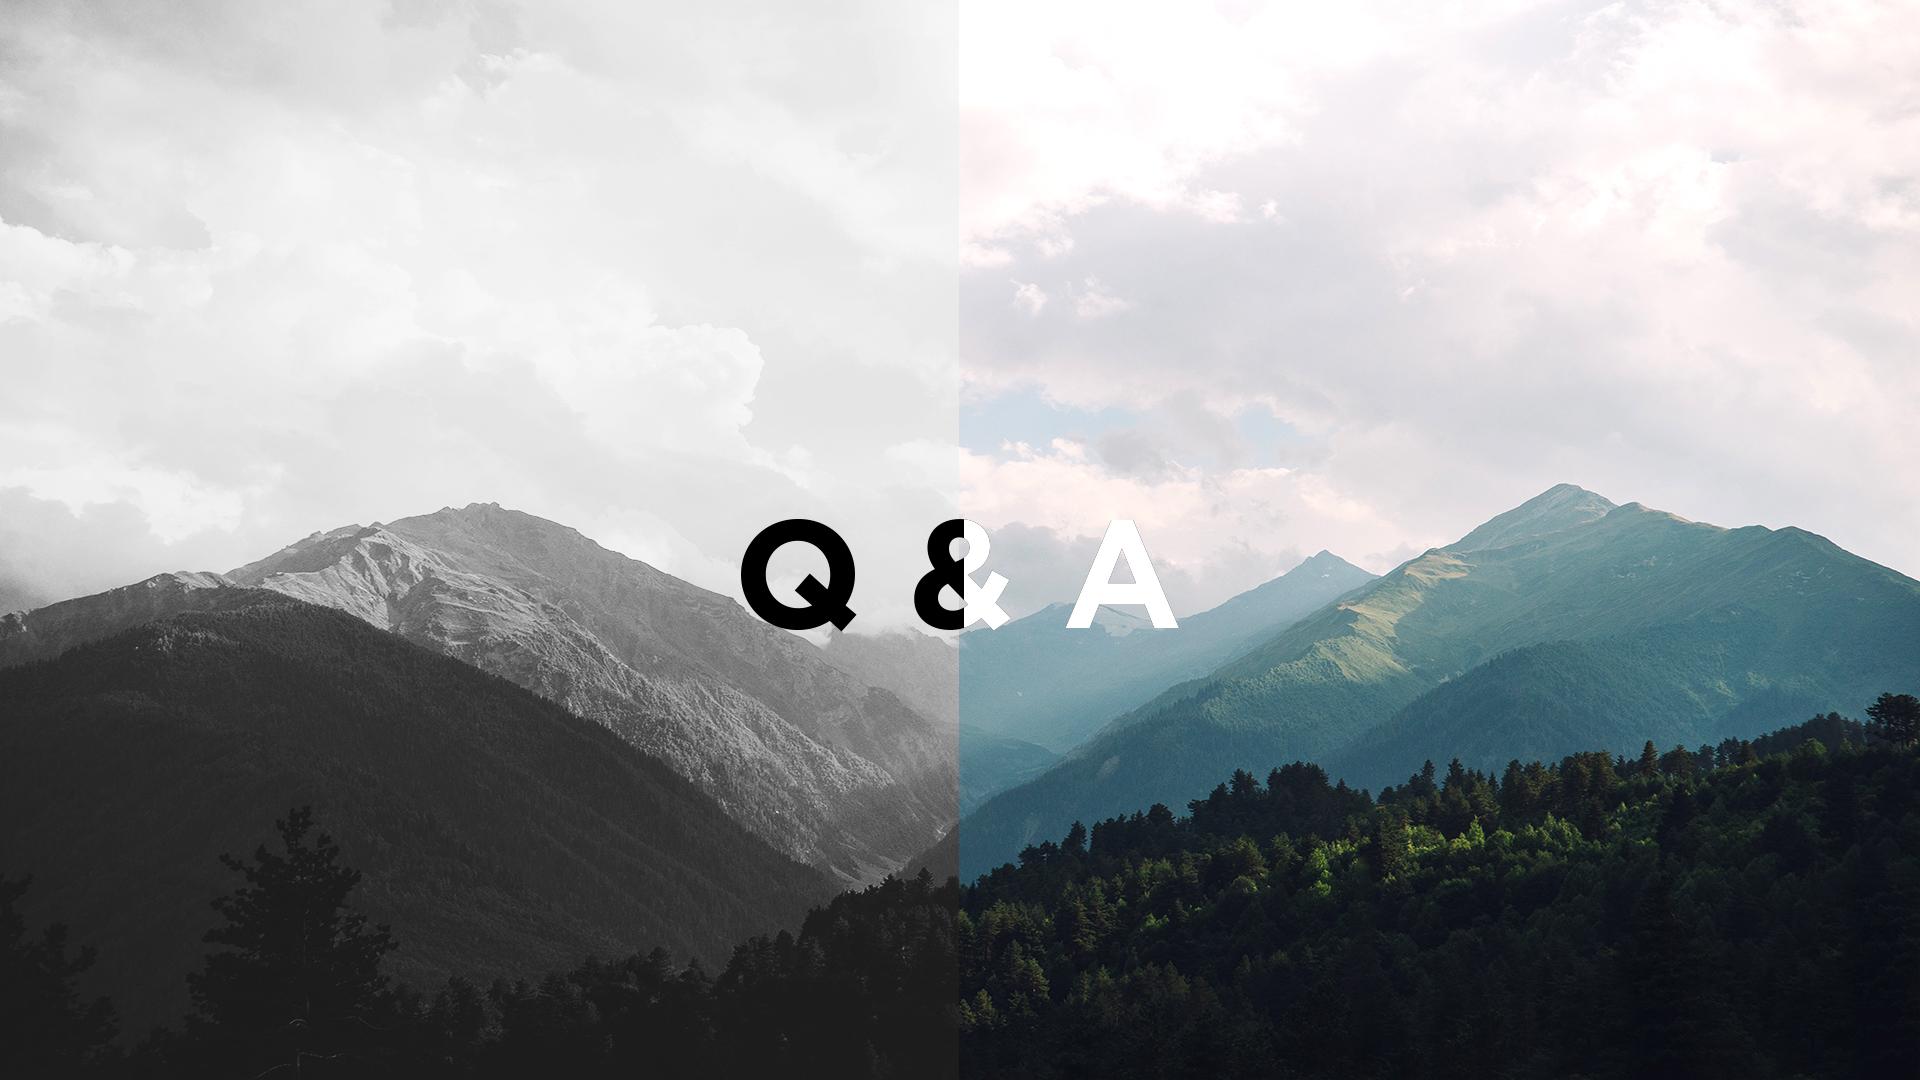 q&a_slide.jpg